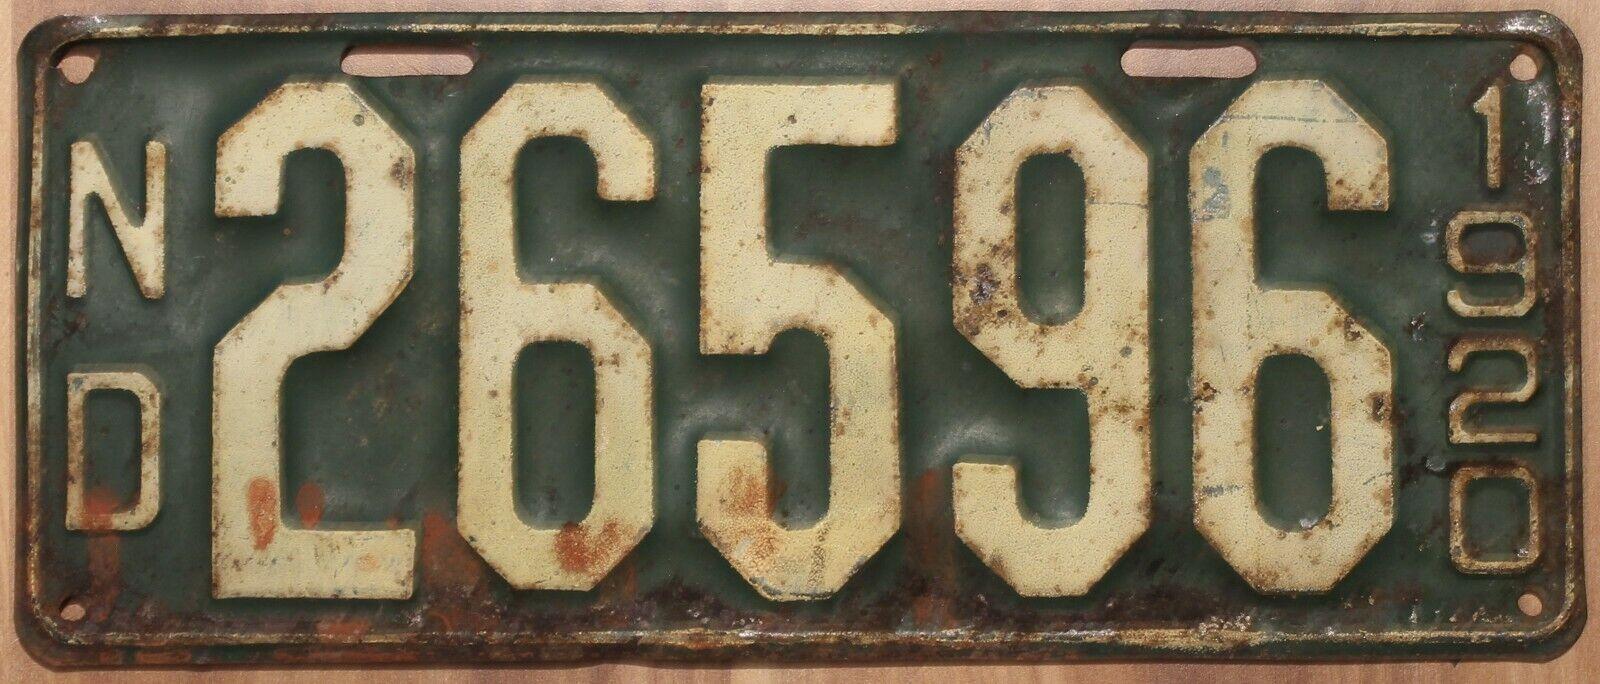 Original Vintage Nummernschild License Plate USA North Dakota 1920 Plaque Targa